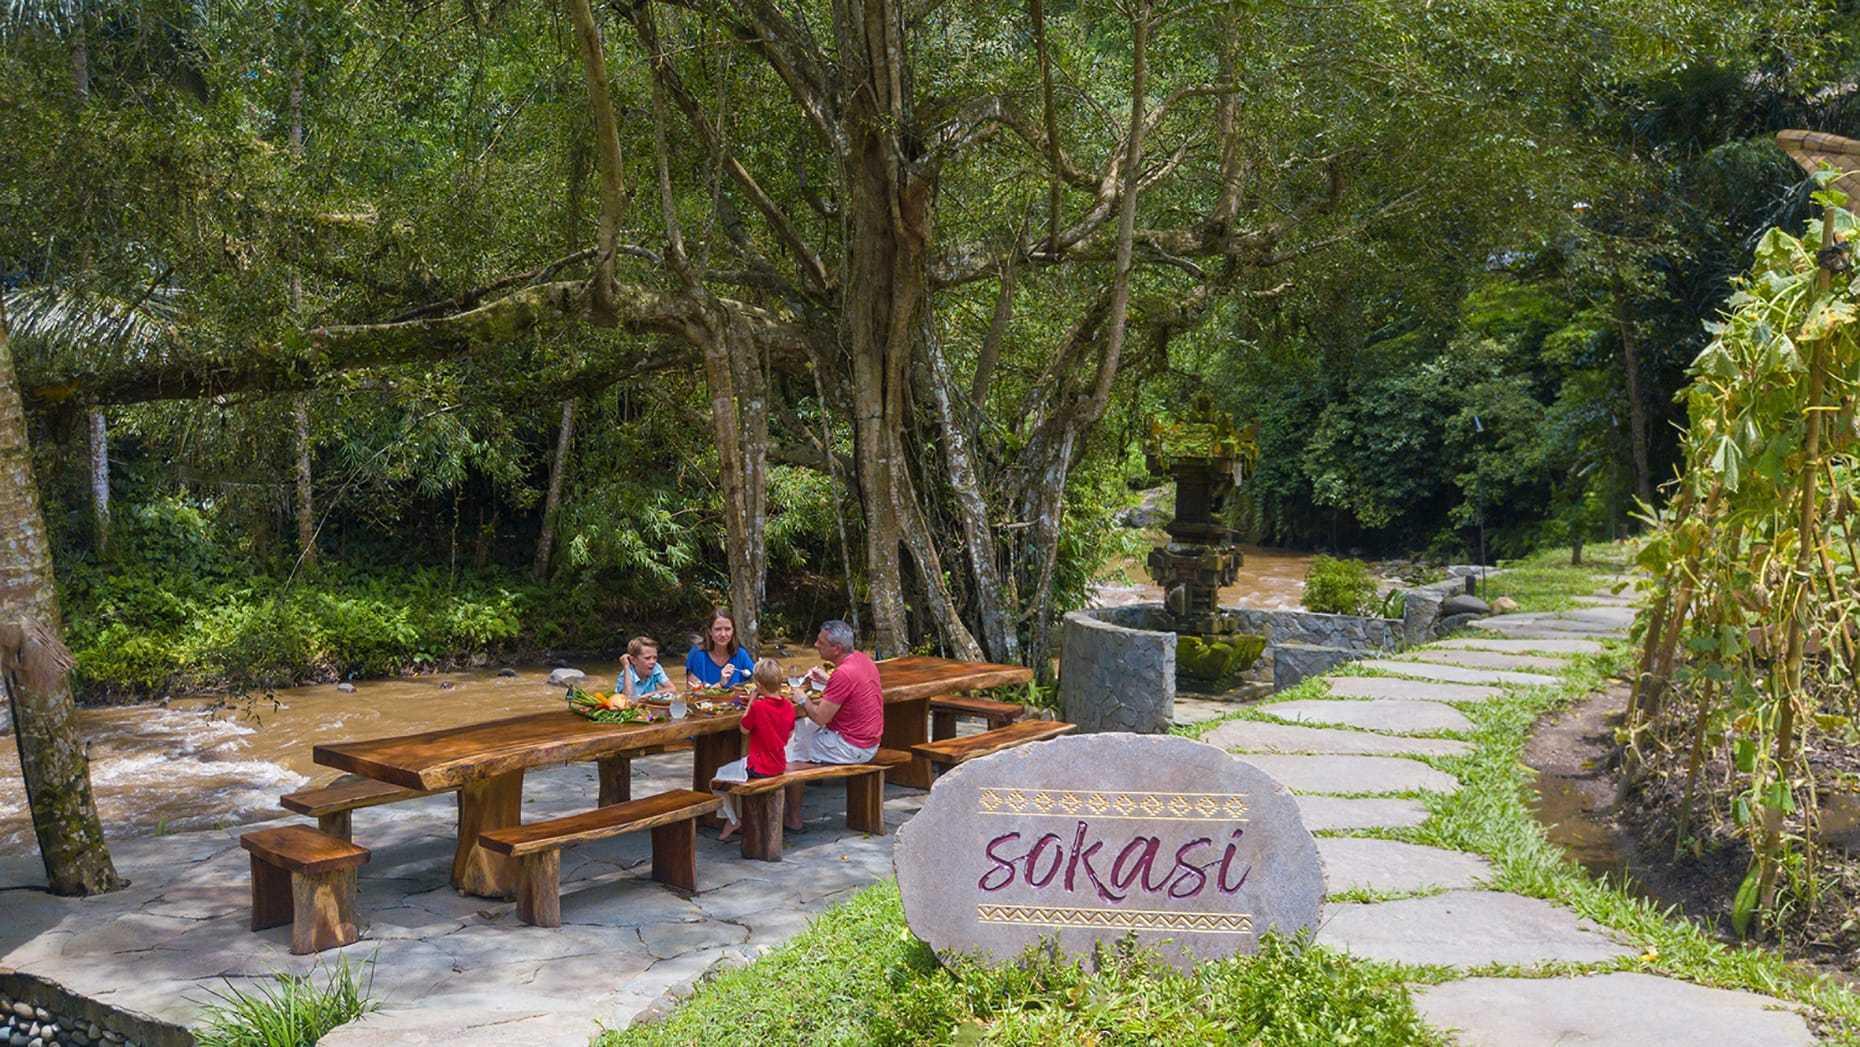 Agung Budi Raharsa | Architecture & Engineering Sokasi Bamboo Cooking Class / School - Bali Bali, Indonesia Bali, Indonesia Agung-Budi-Raharsa-Sokasi-Cooking-Class-School-Bali  88761